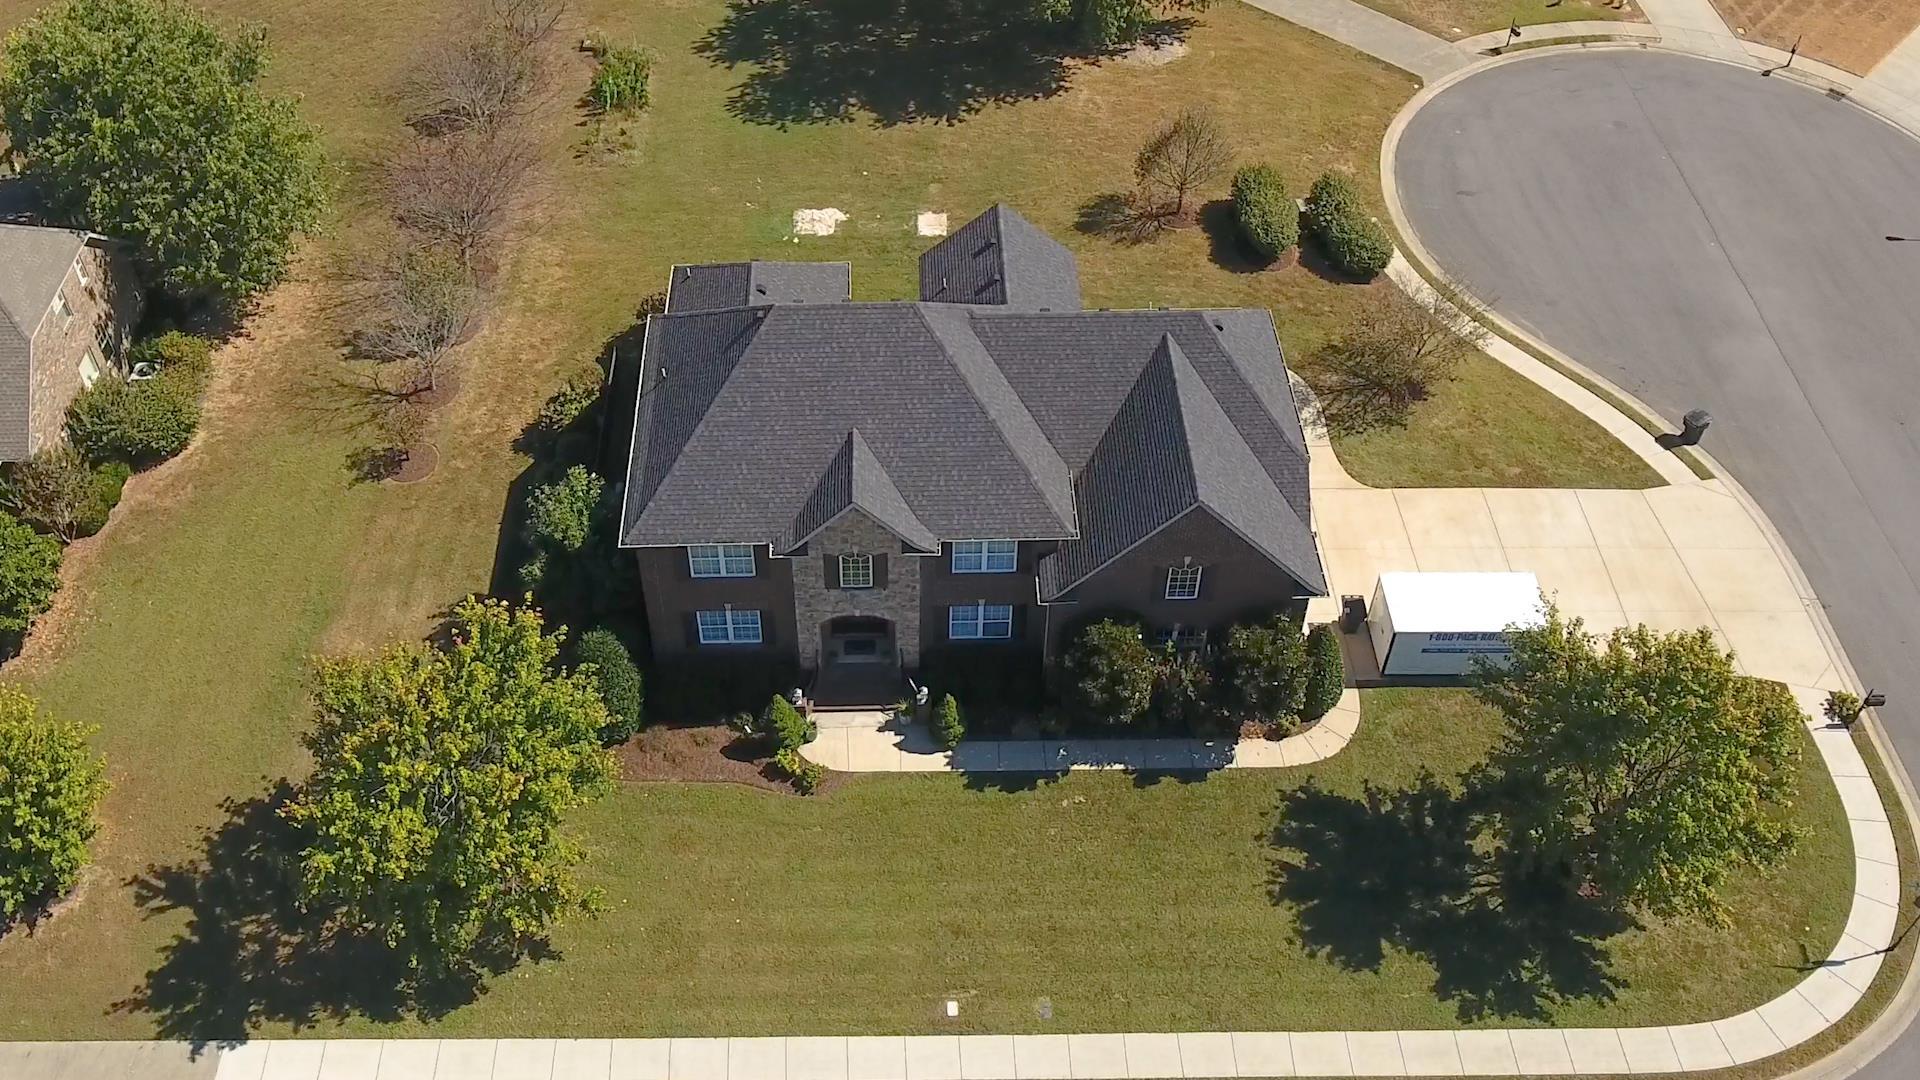 2932 Frank Robinson Dr, Murfreesboro, TN 37130 - Murfreesboro, TN real estate listing